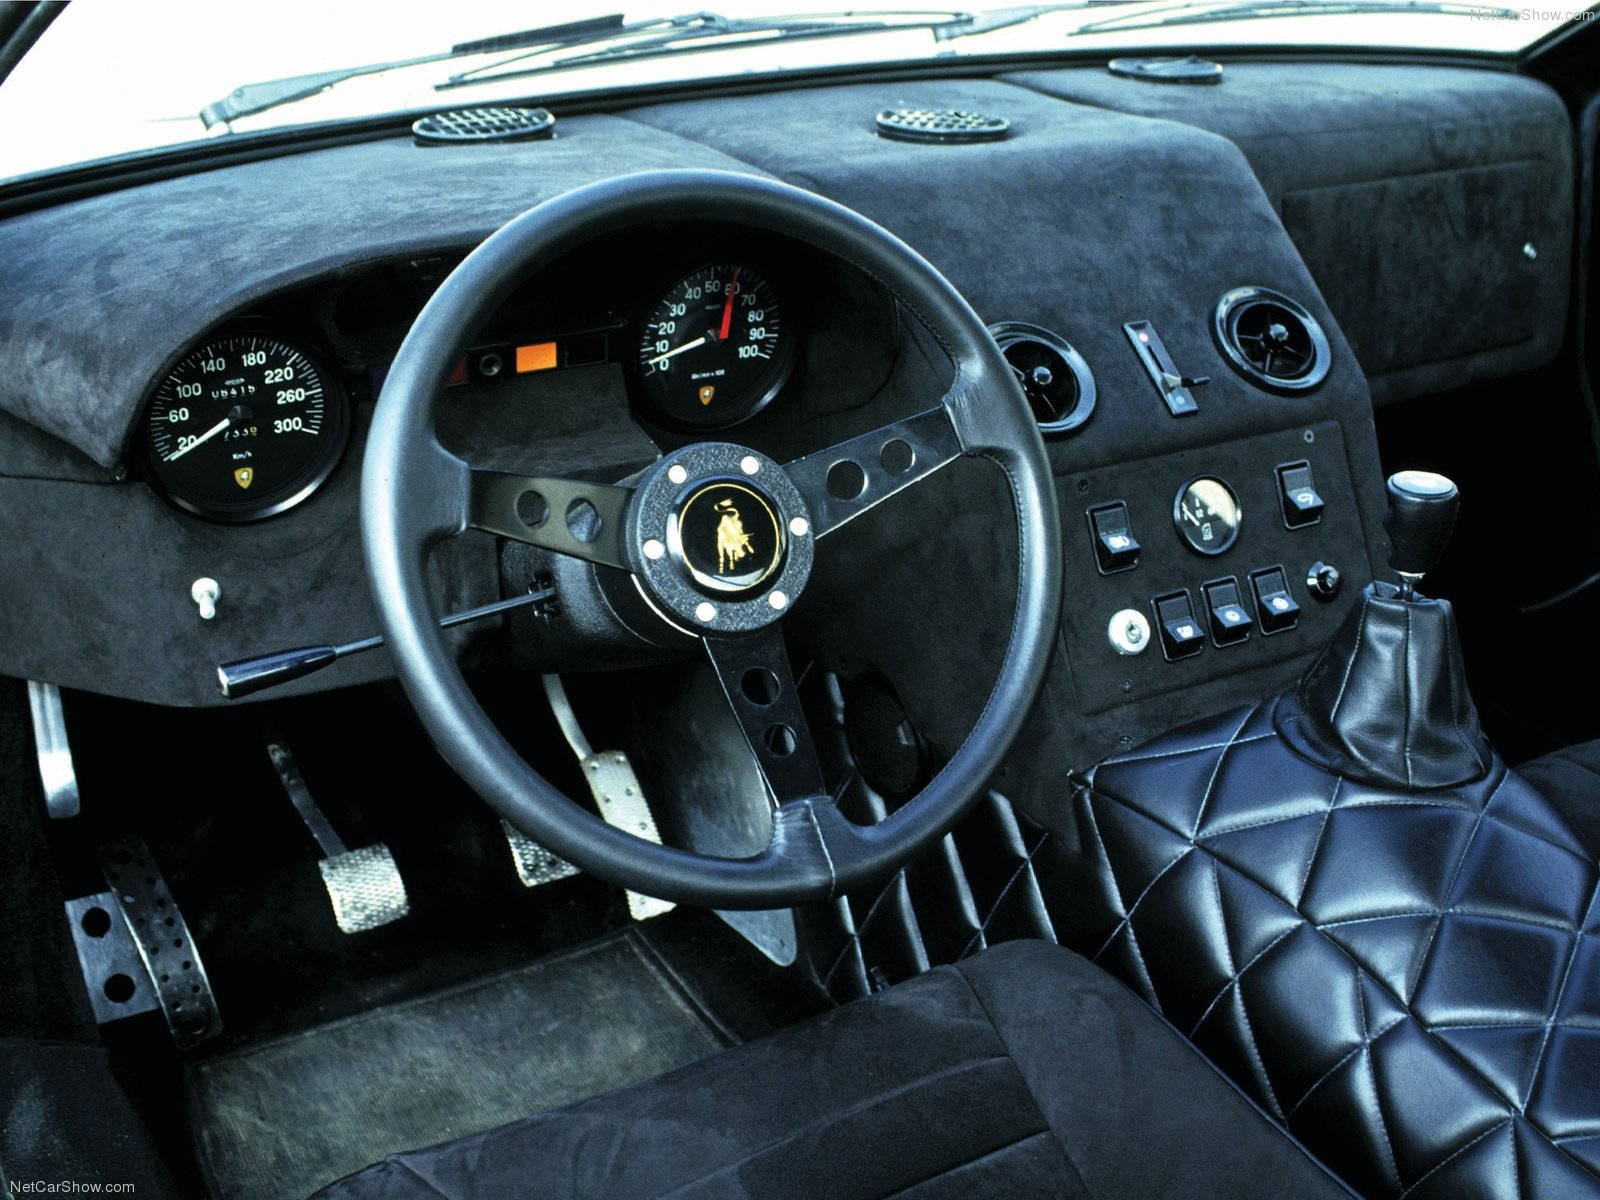 Hình ảnh siêu xe Lamborghini 400 GT 1966 & nội ngoại thất